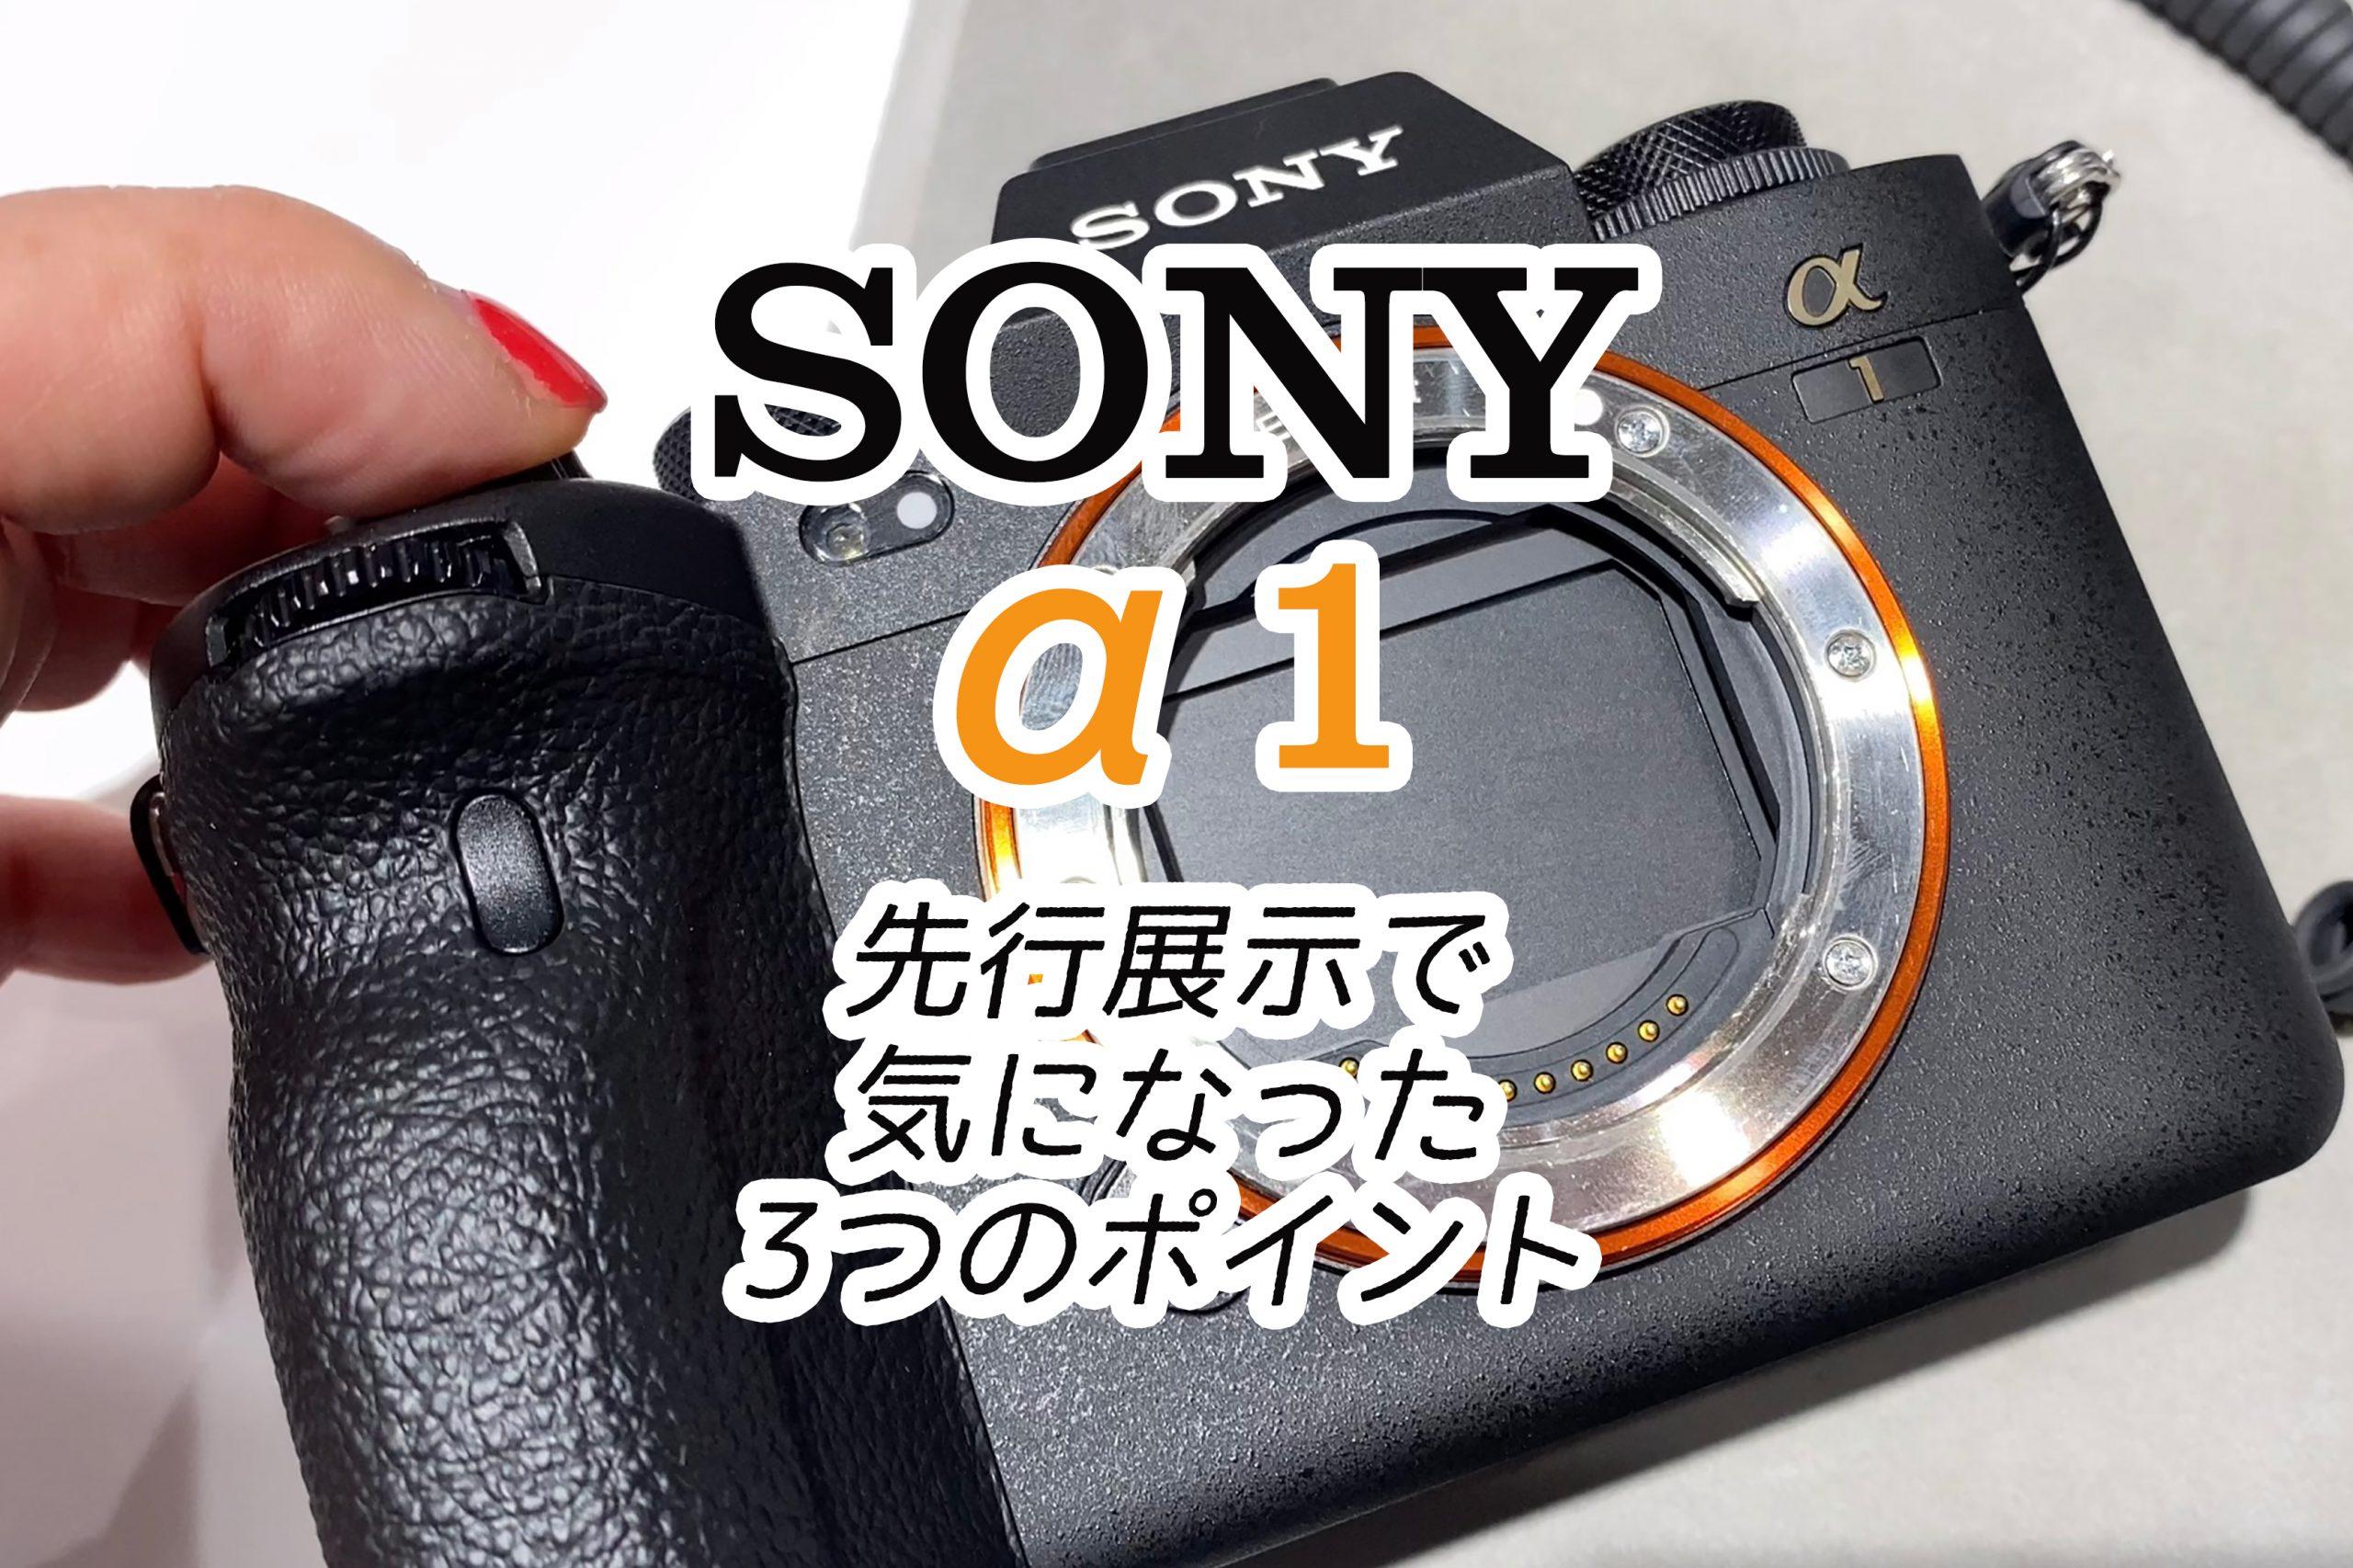 【SONY】α1先行体験・展示で気になった3つのポイント